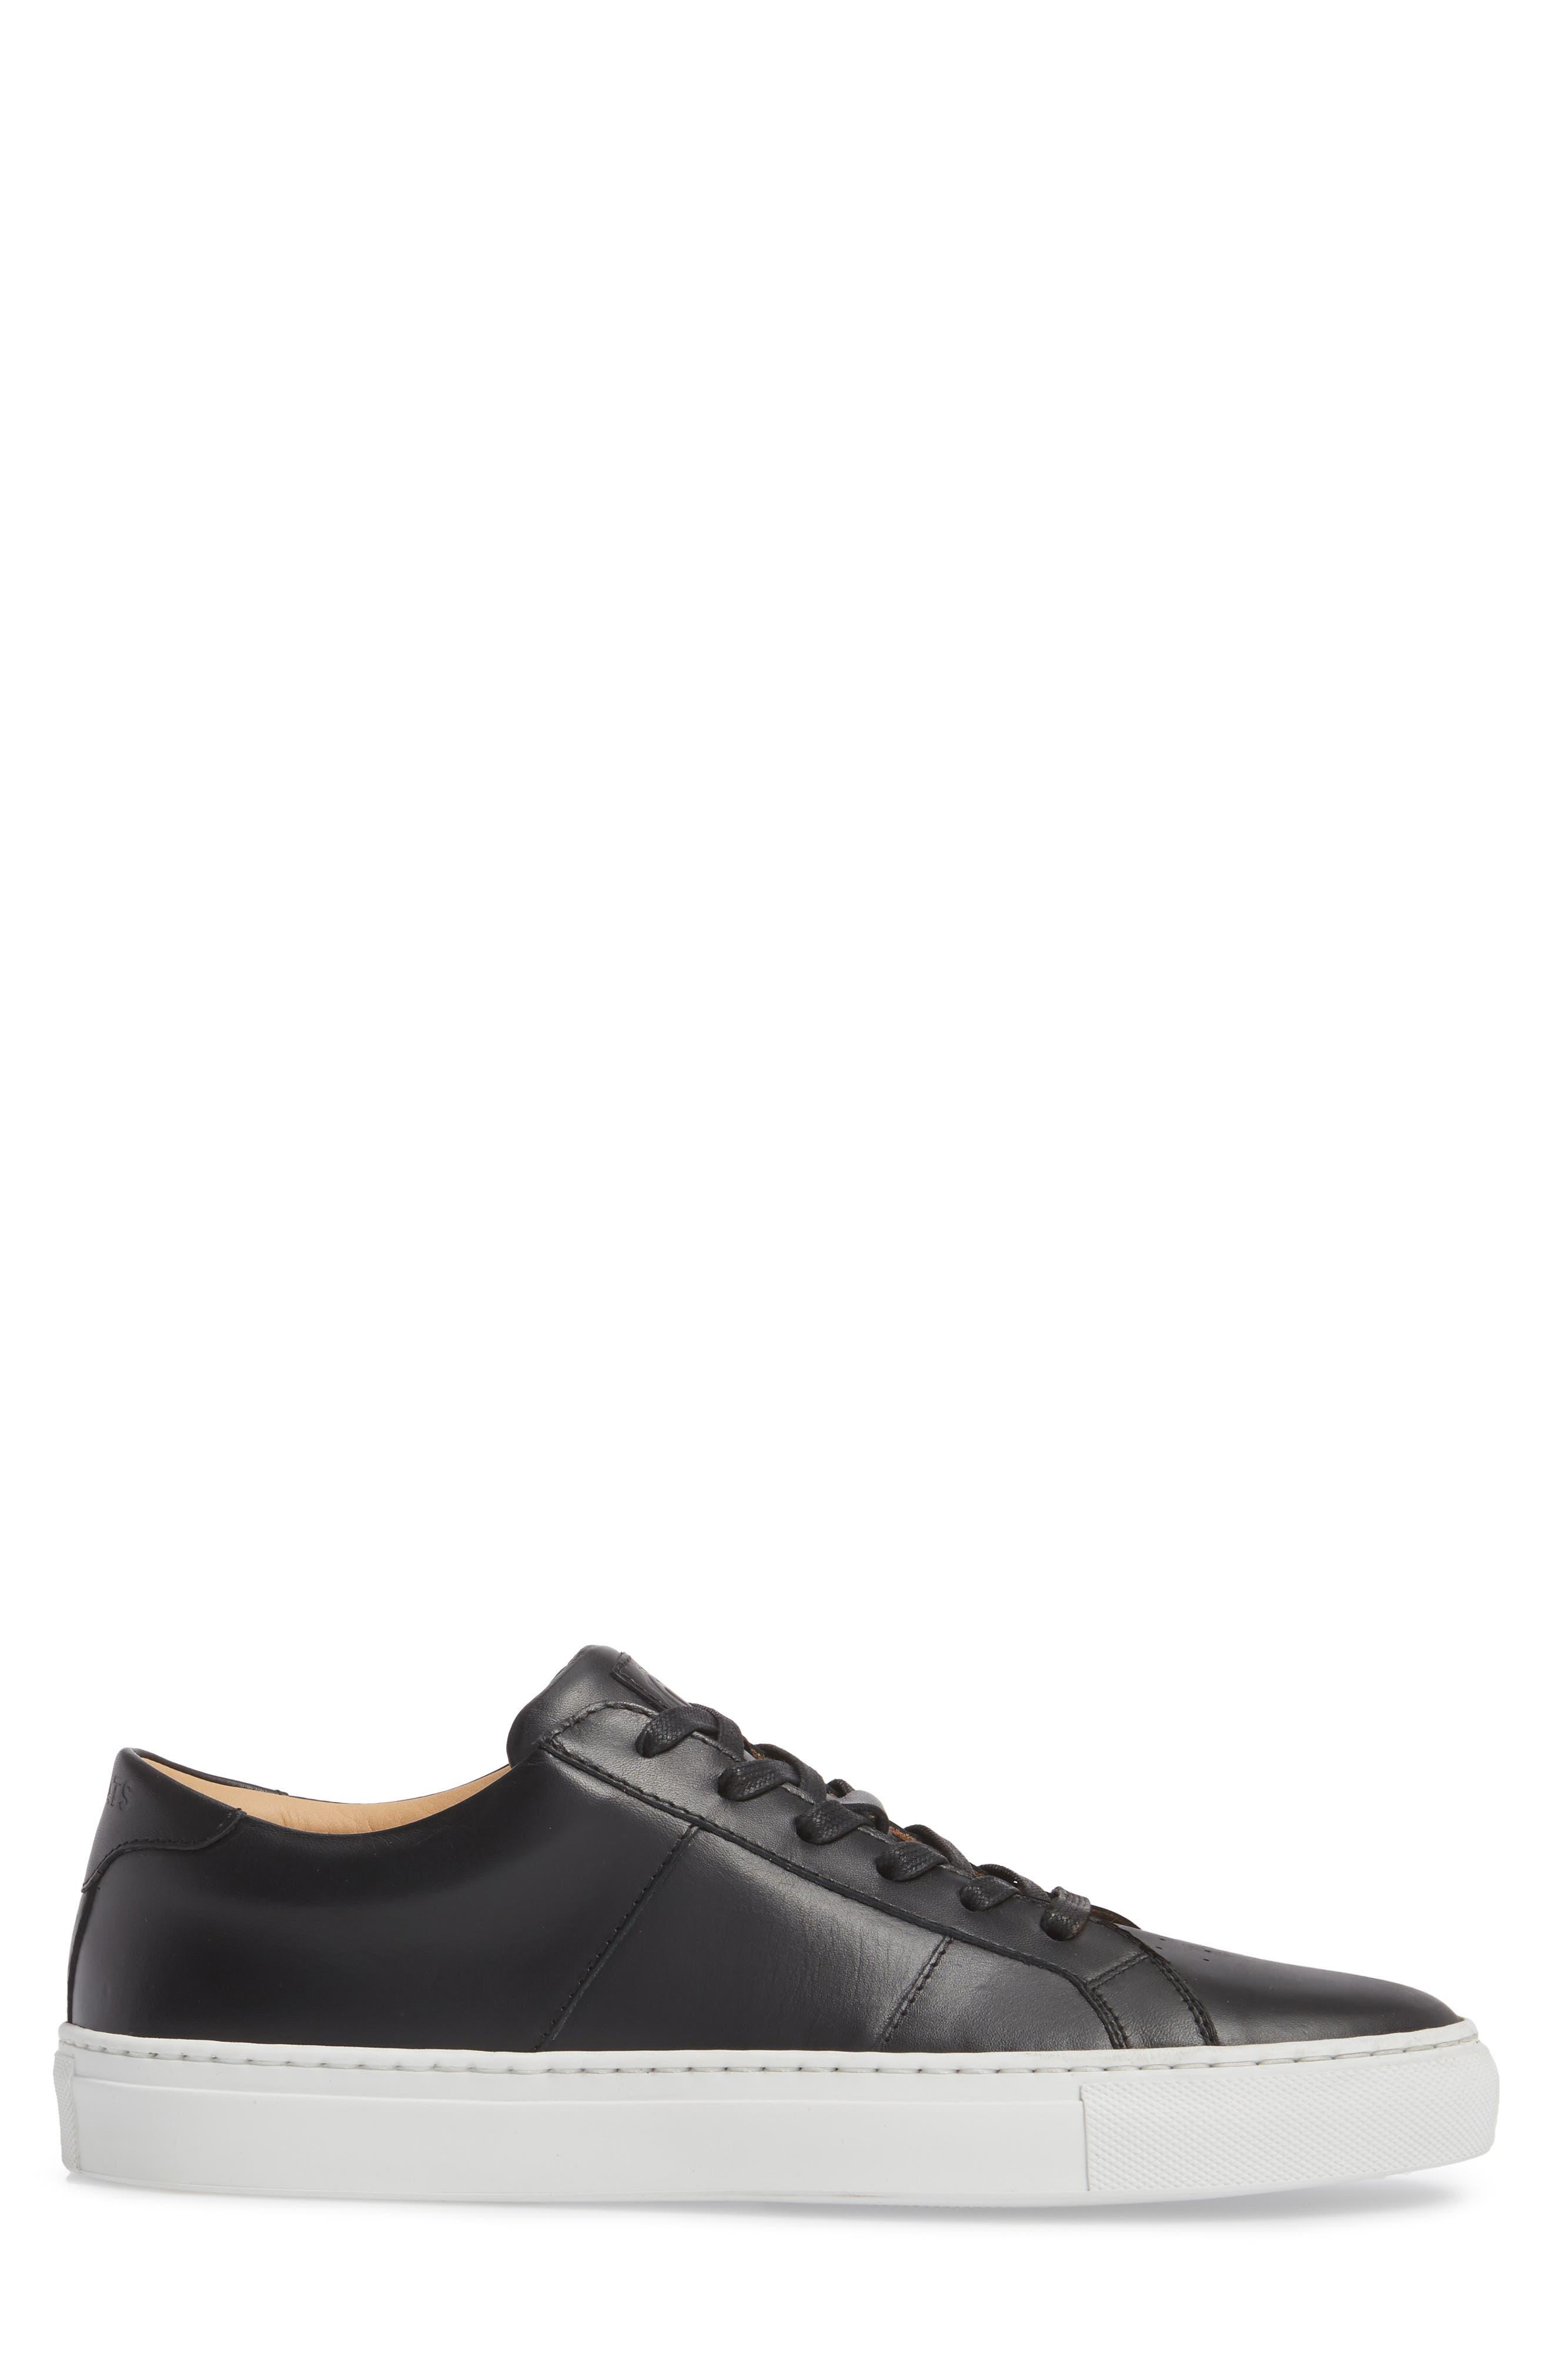 GREATS, Royale Sneaker, Alternate thumbnail 3, color, 001